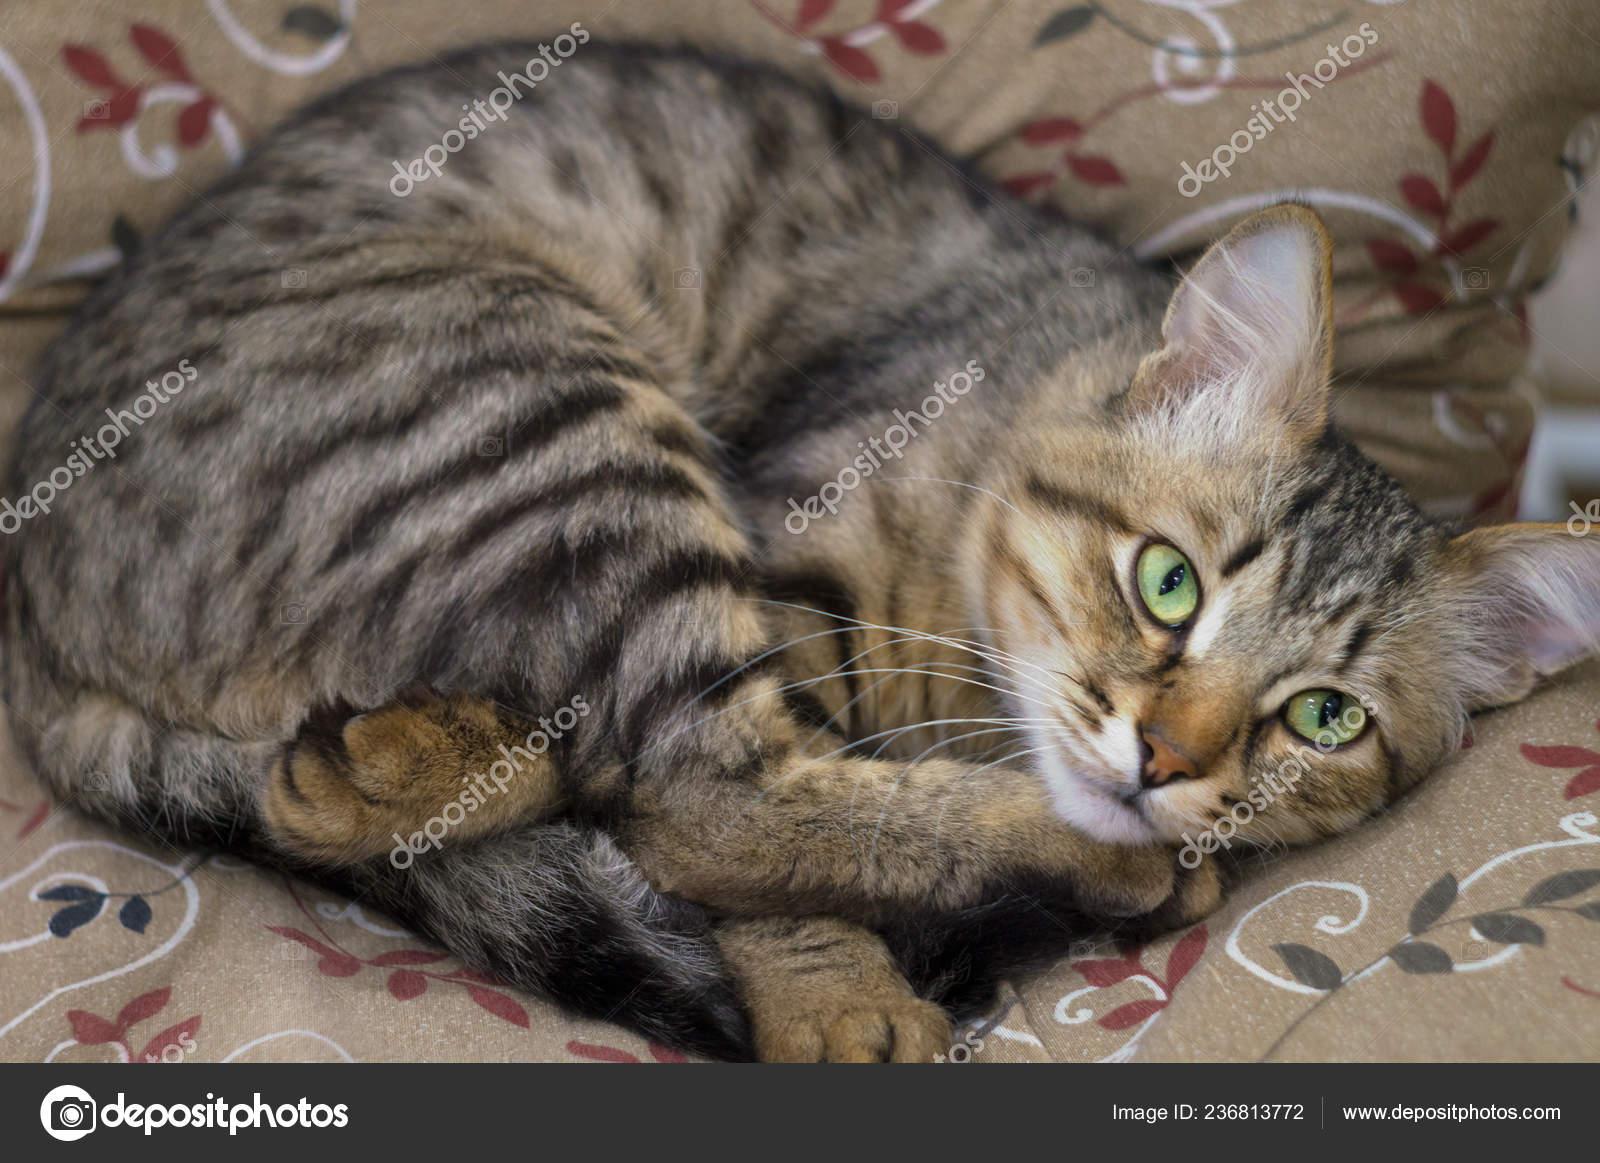 Cute portrait of a lazy sleeping striped beautiful cat